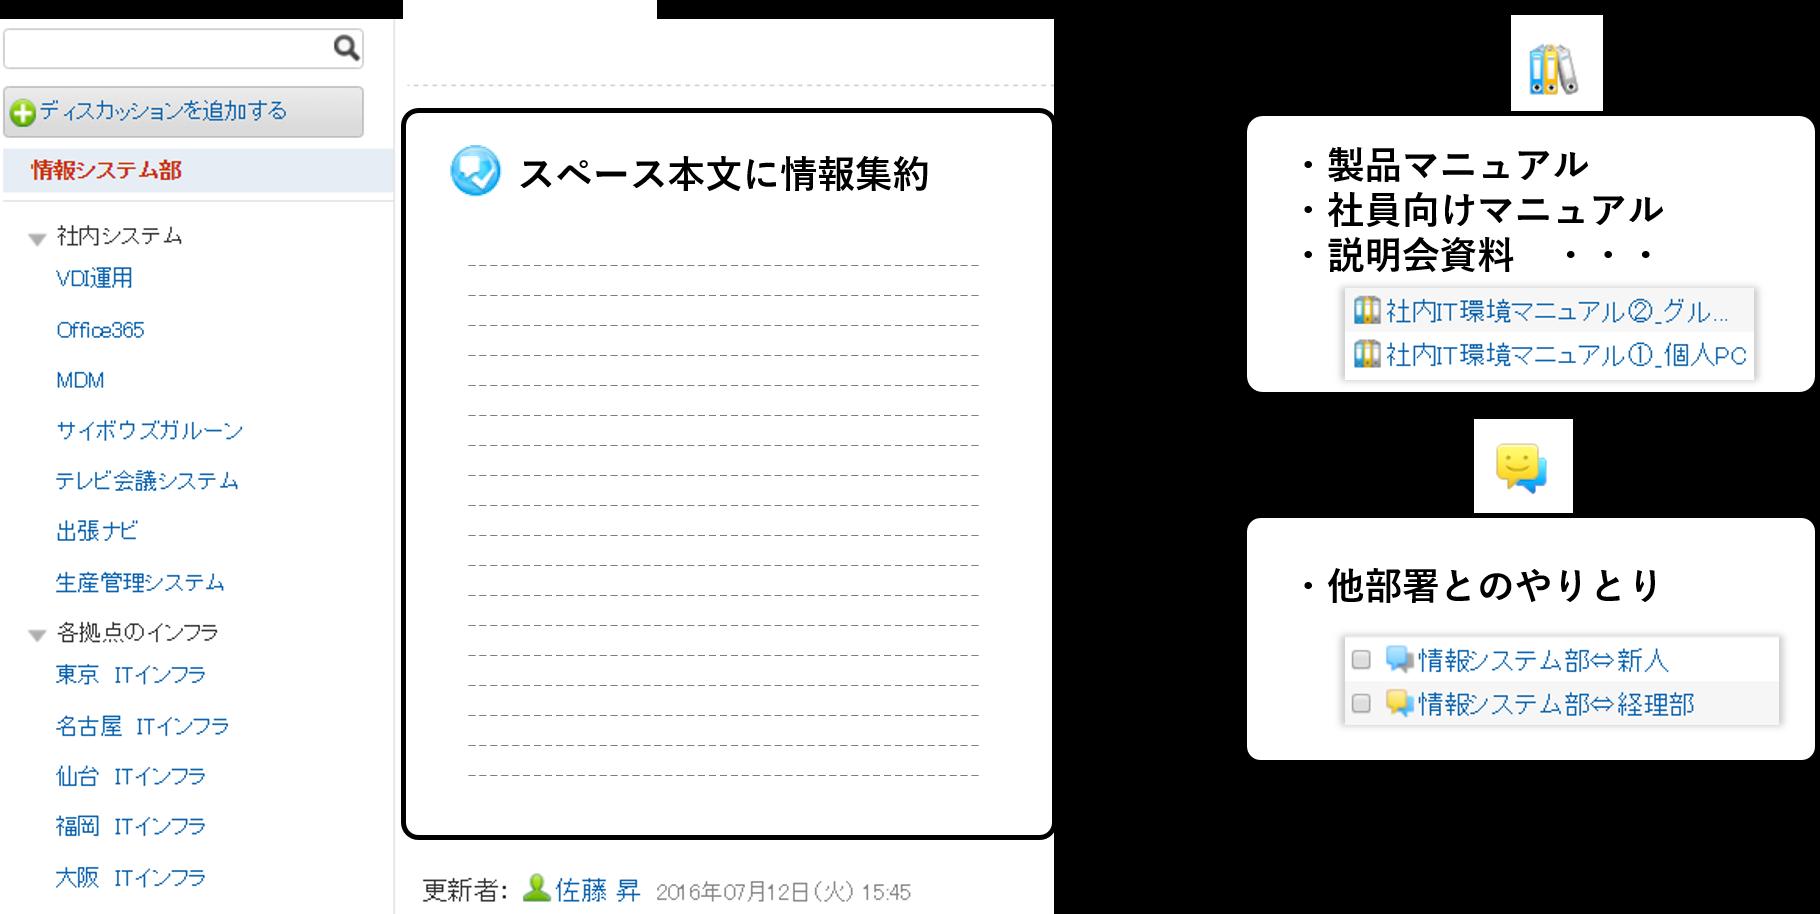 https://enterprise.cybozu.co.jp/d9d1420225cb82fbec9905798a360eb763f4e072.png